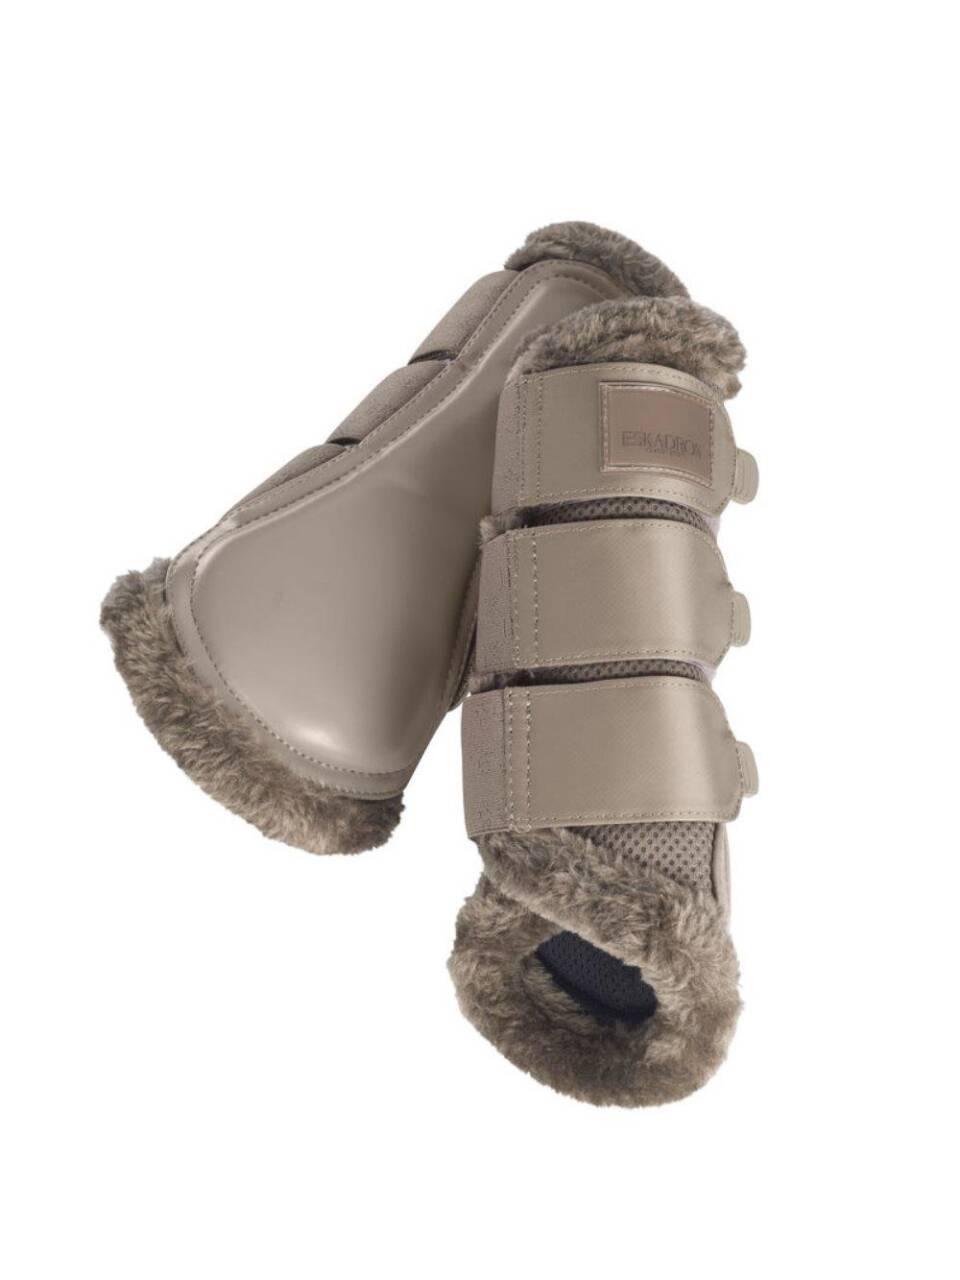 Eskadron tendon boots mesh beige gamacher